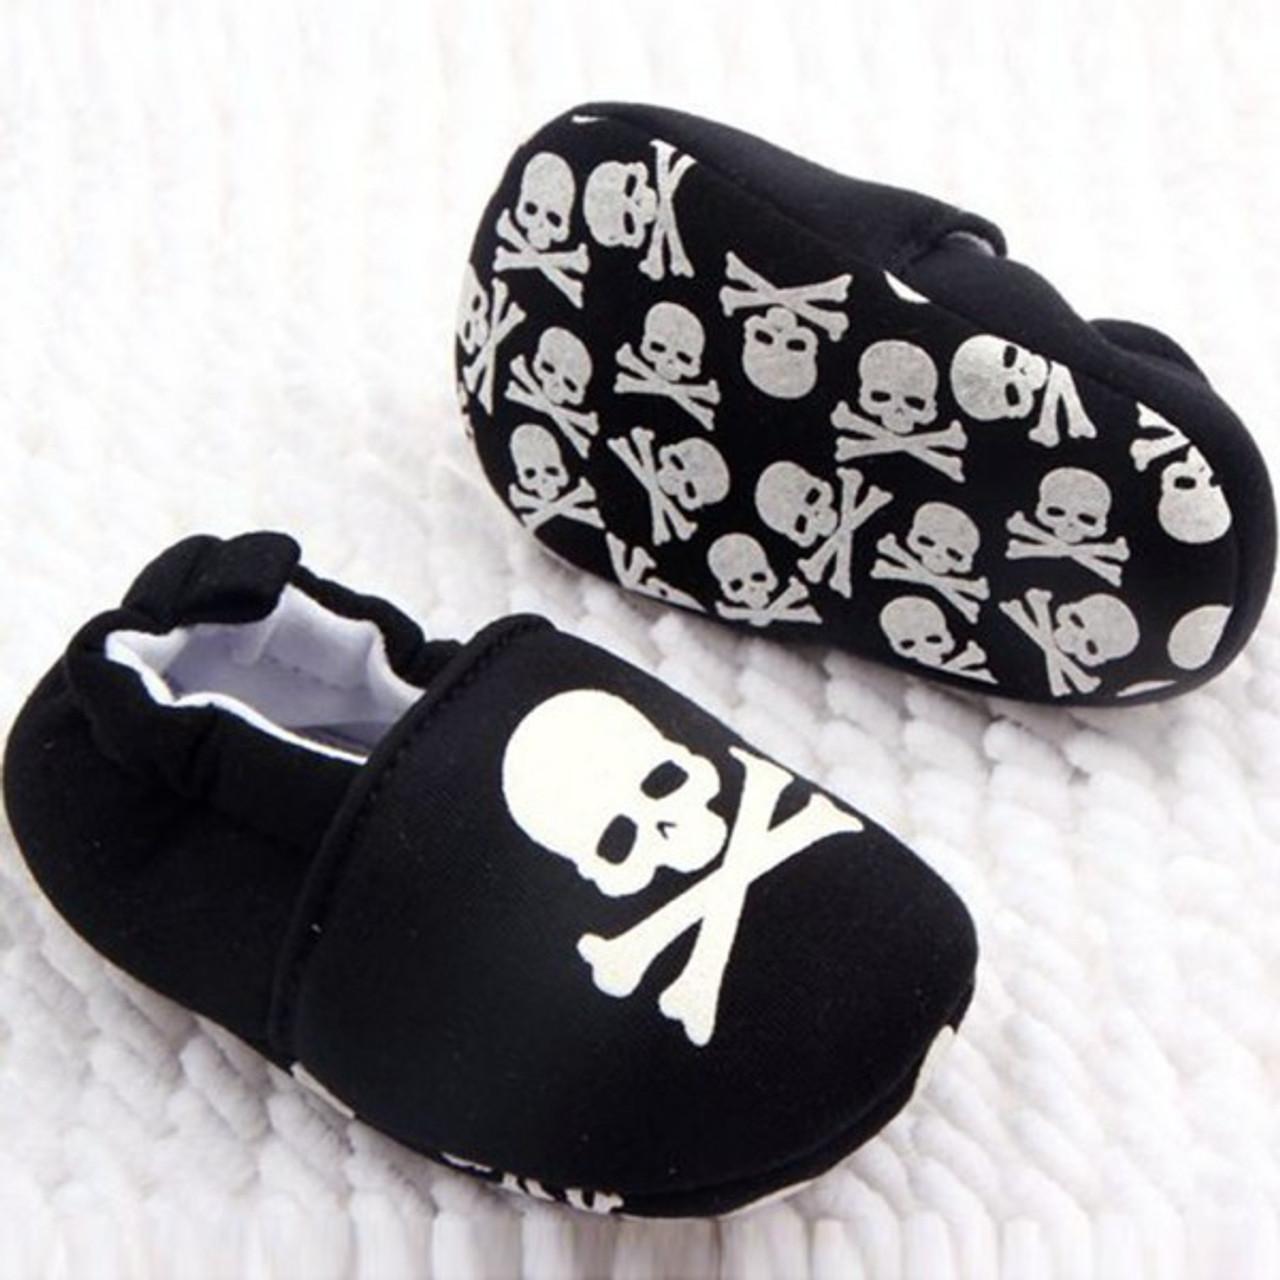 Black and white skull baby shoes 14ebd79edc0